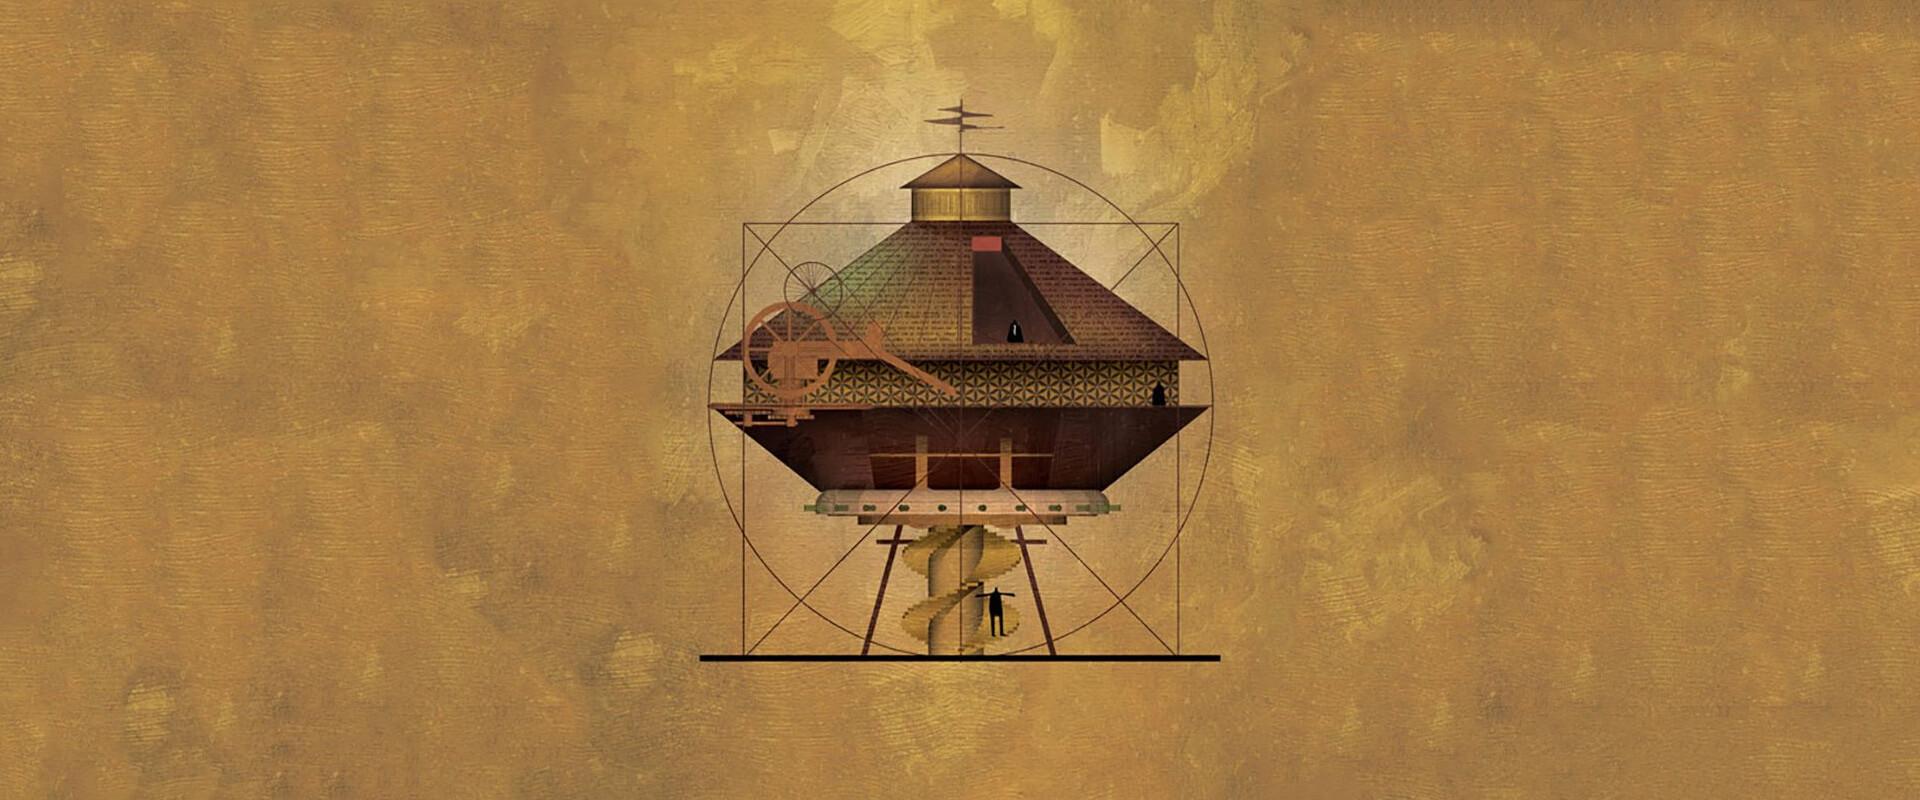 Transformando pintores en arquitectos